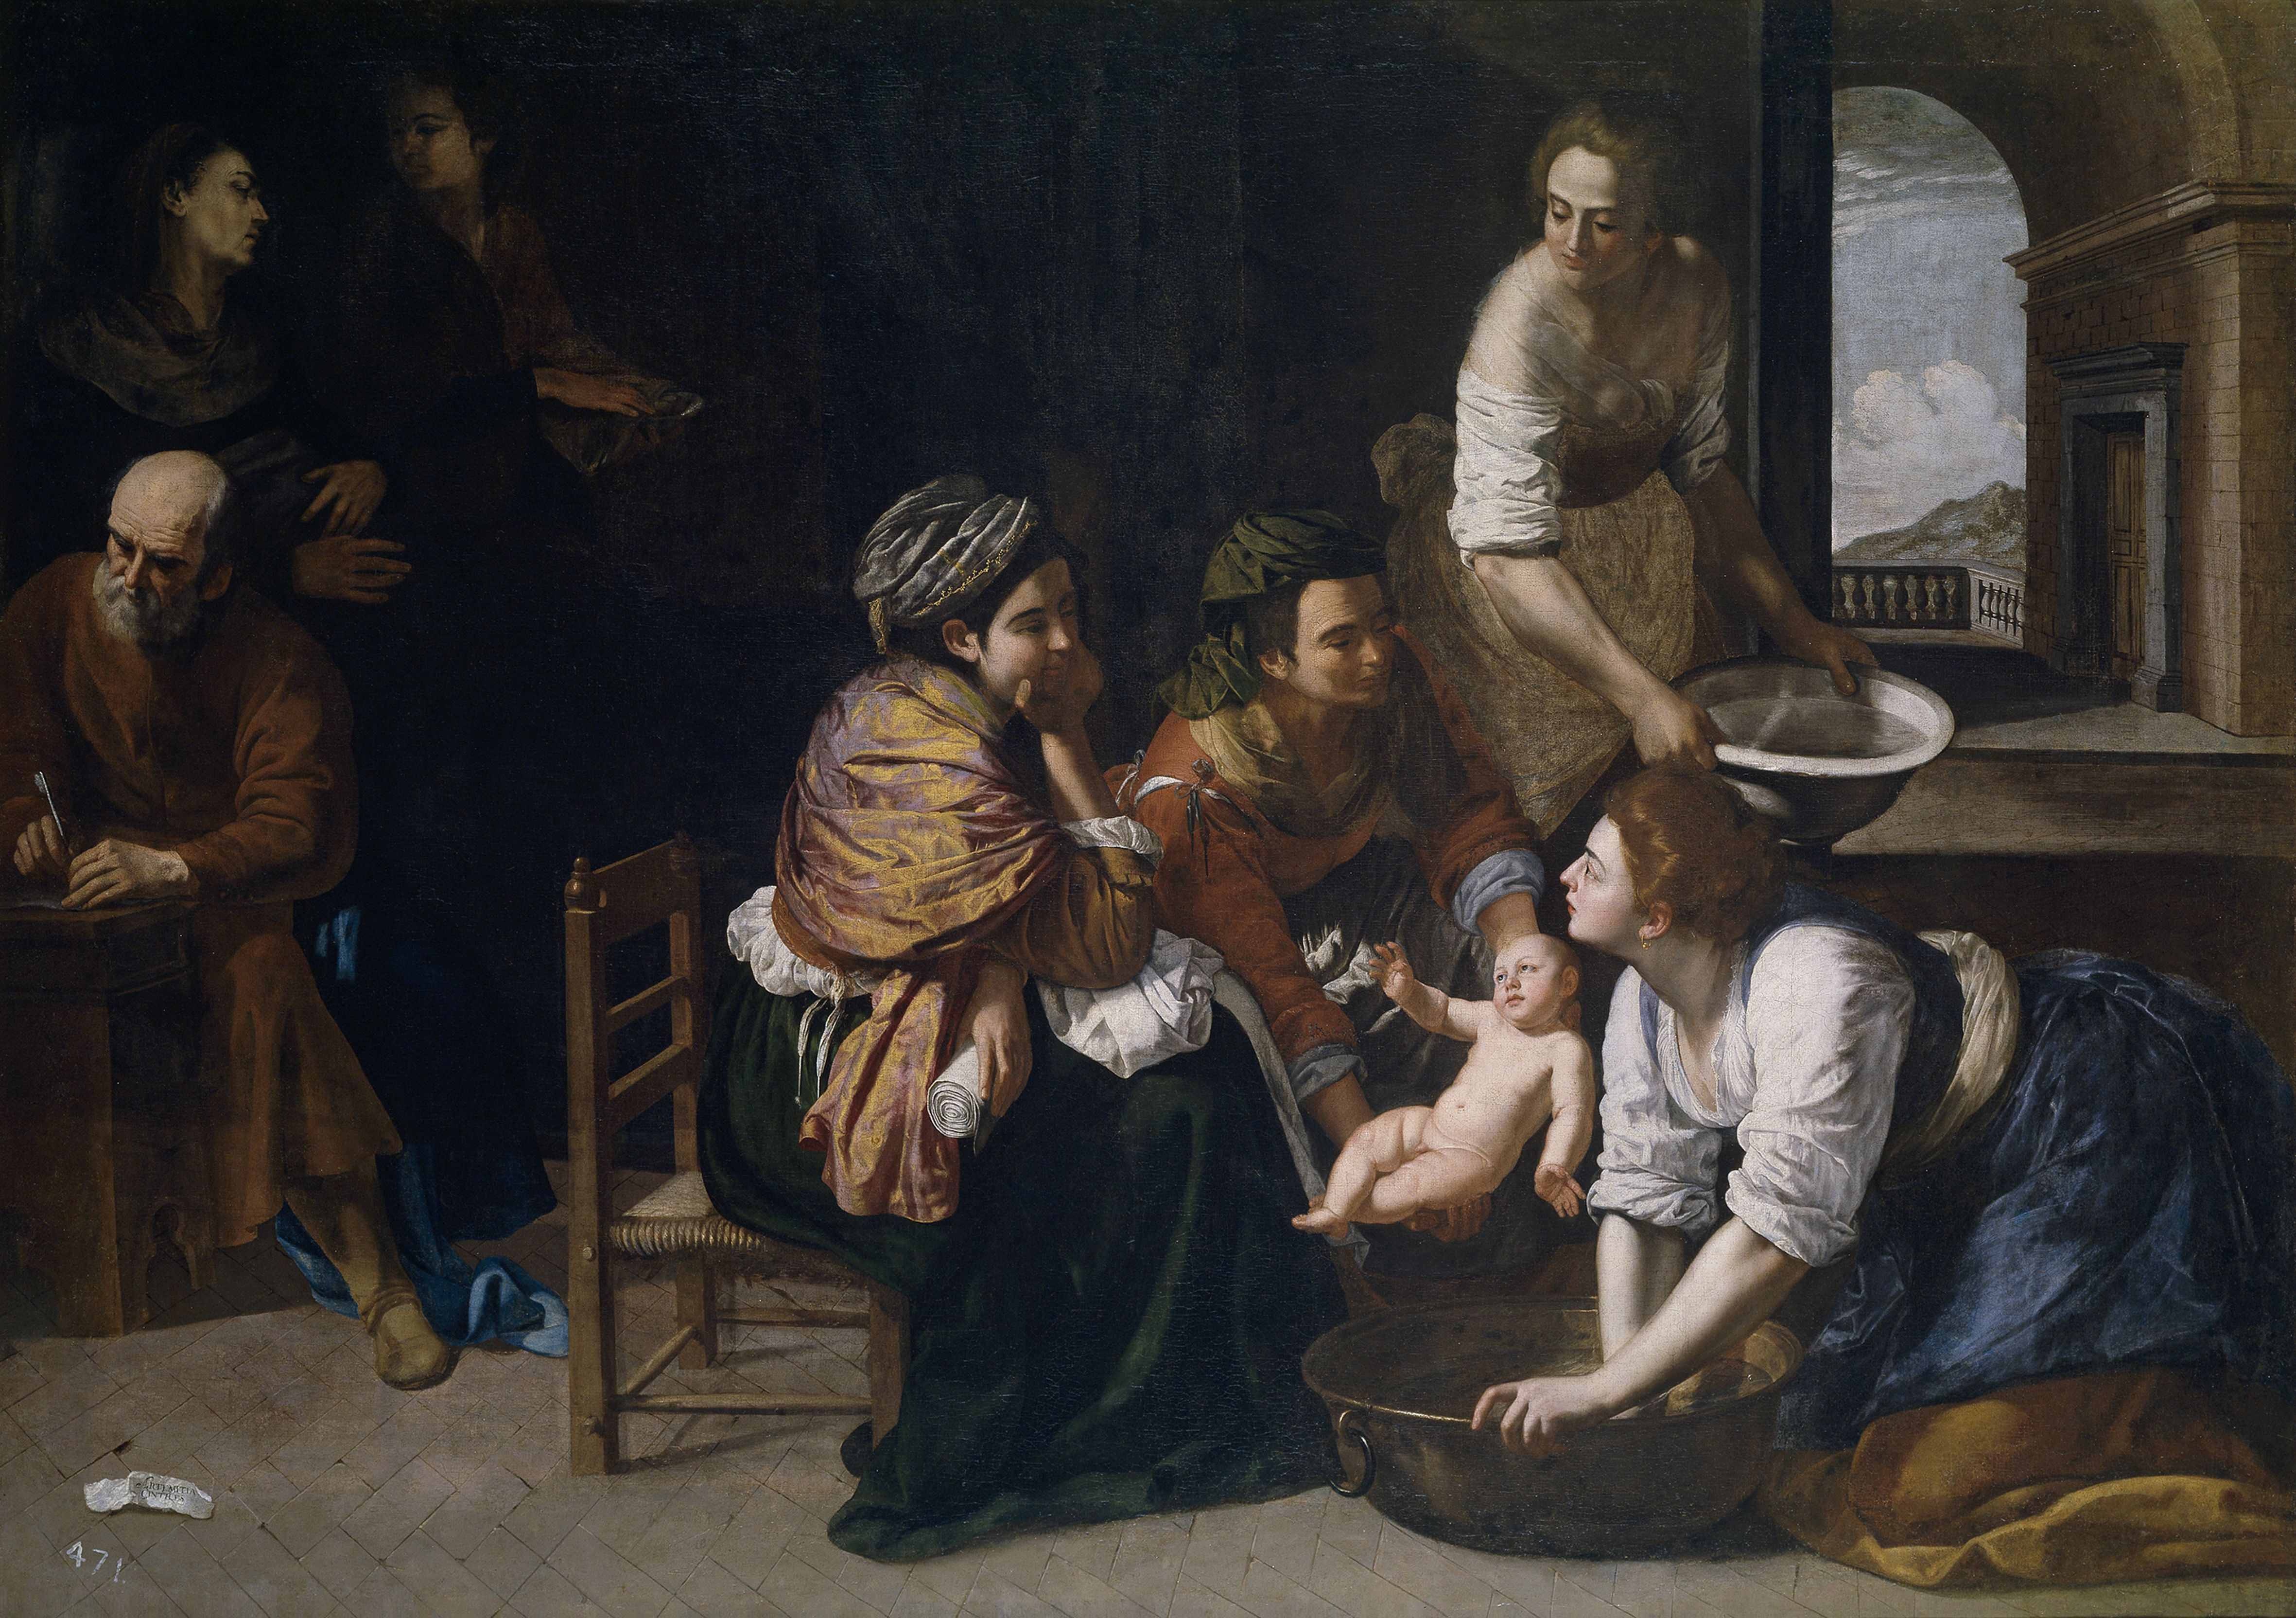 Painting depicting the Birth of Saint John the Baptist